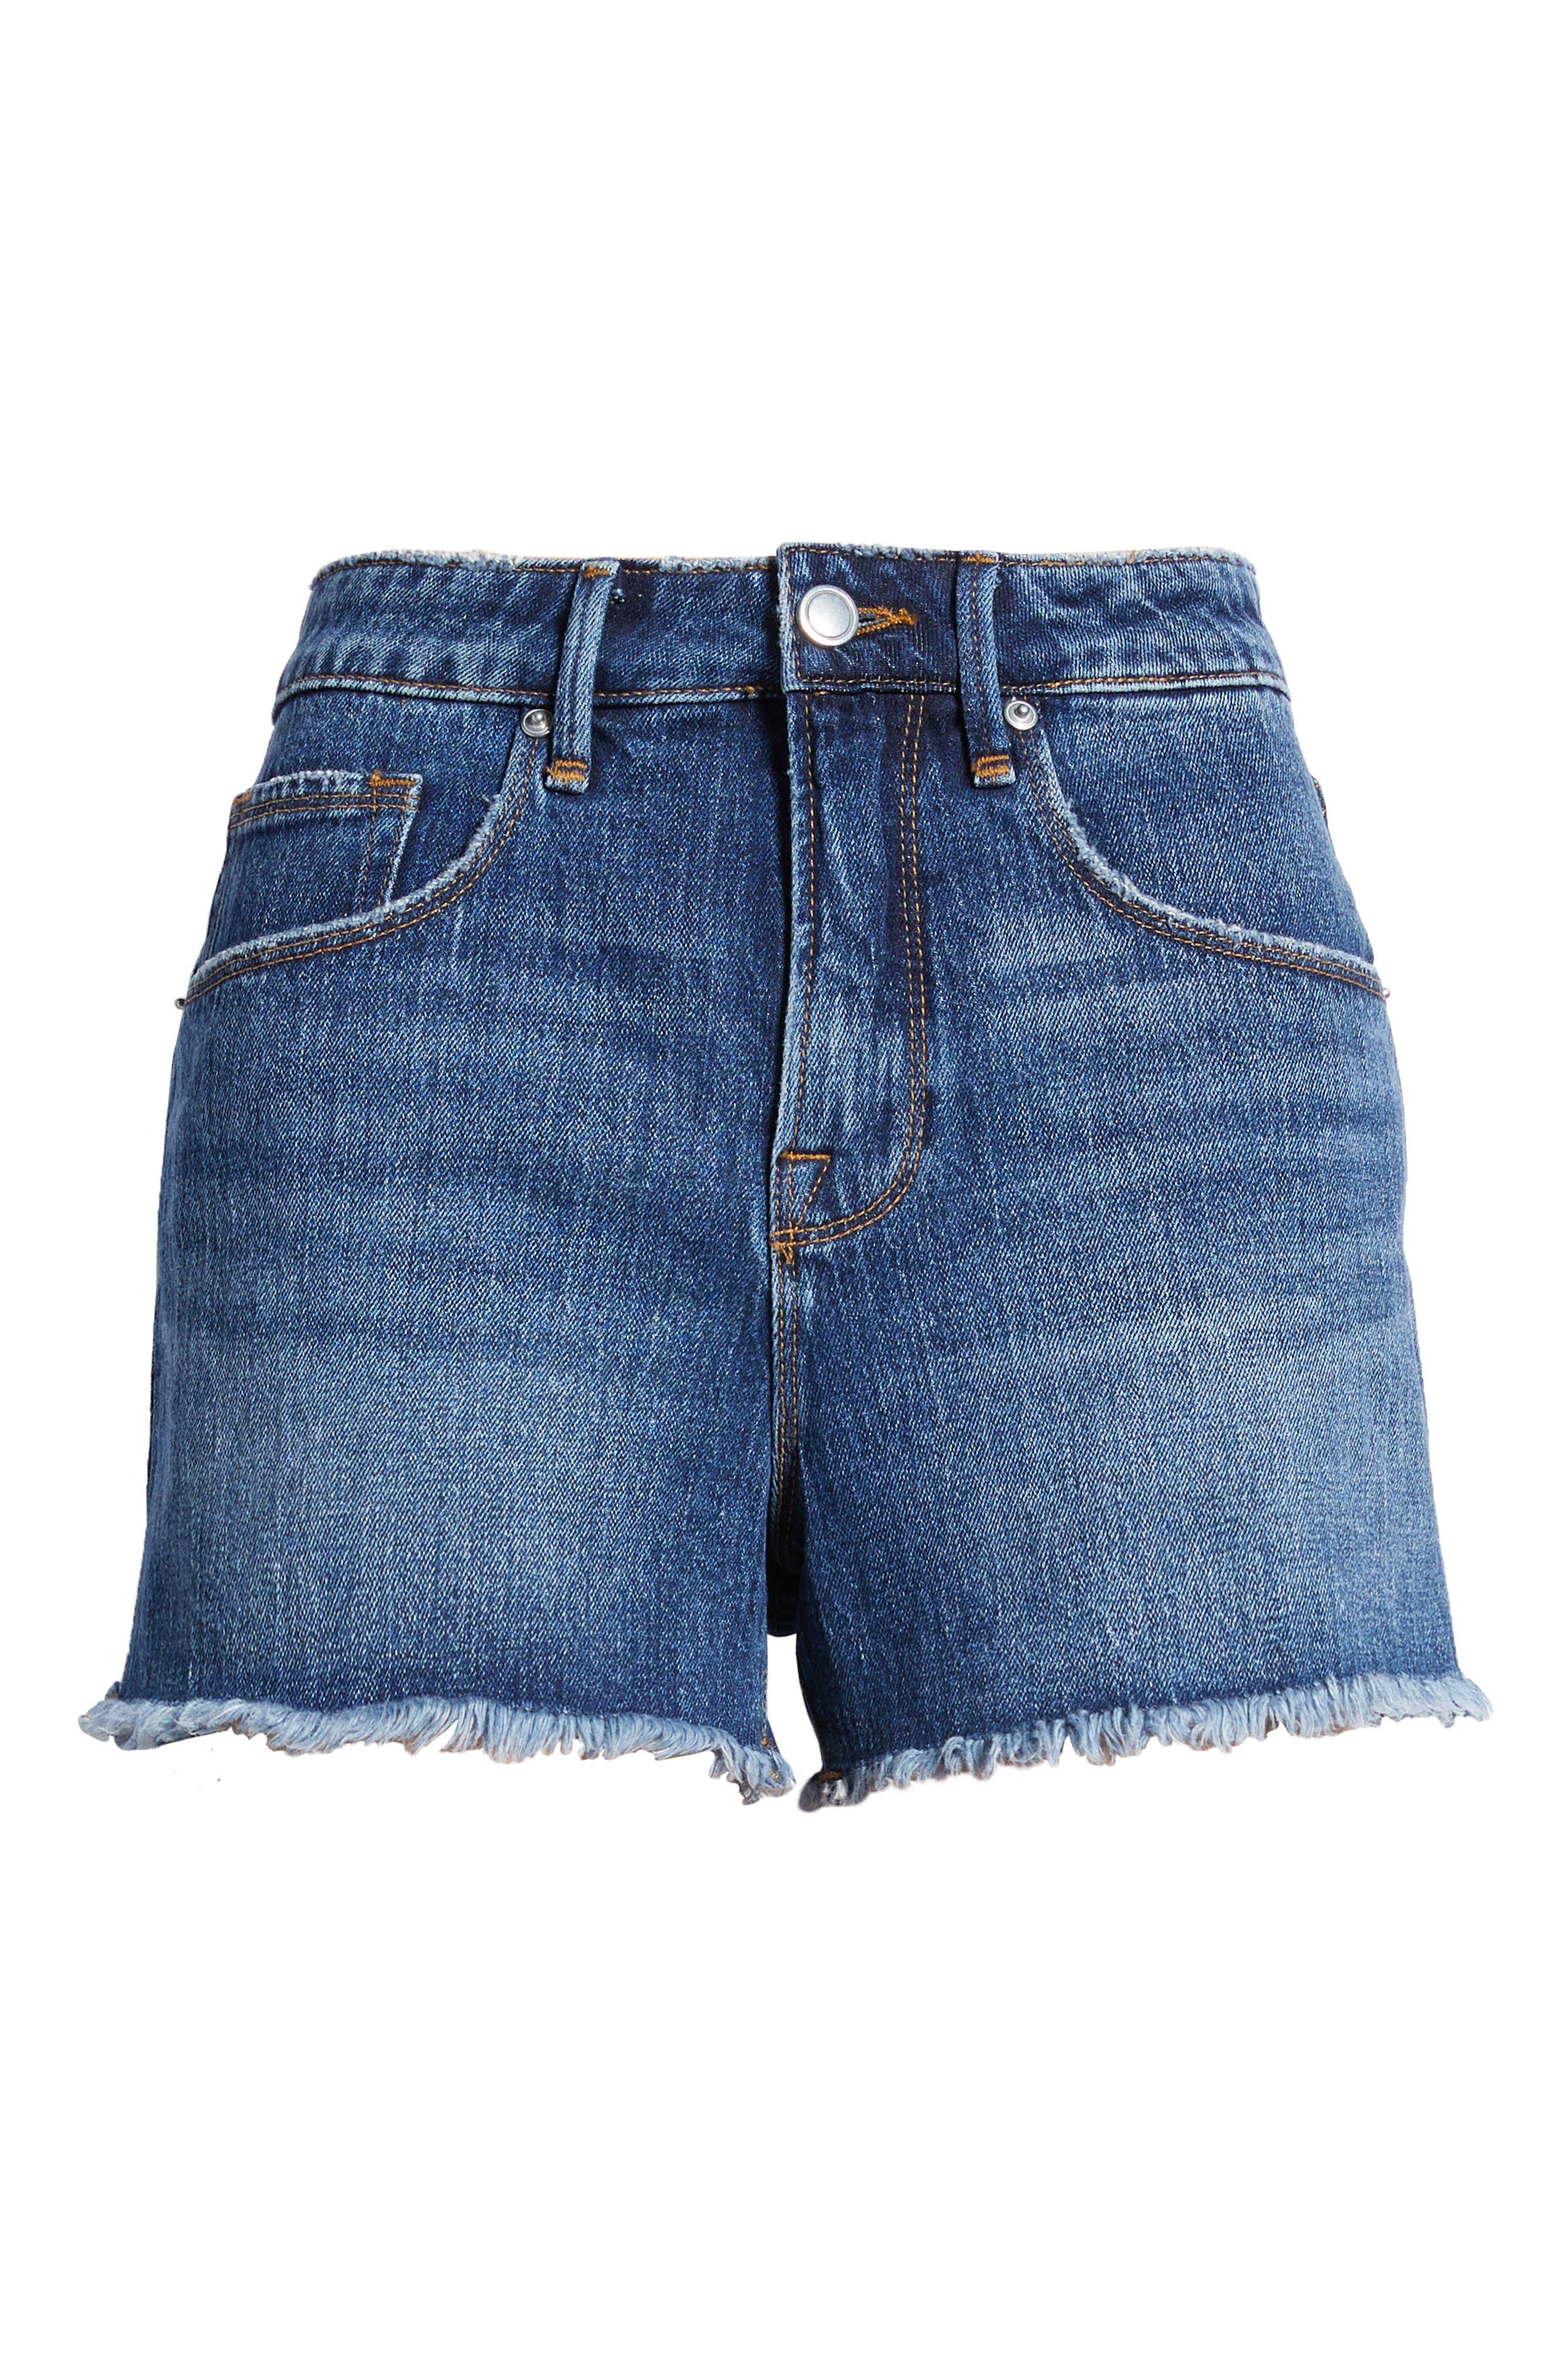 Plus Women's Good American Good Vintage Shorts